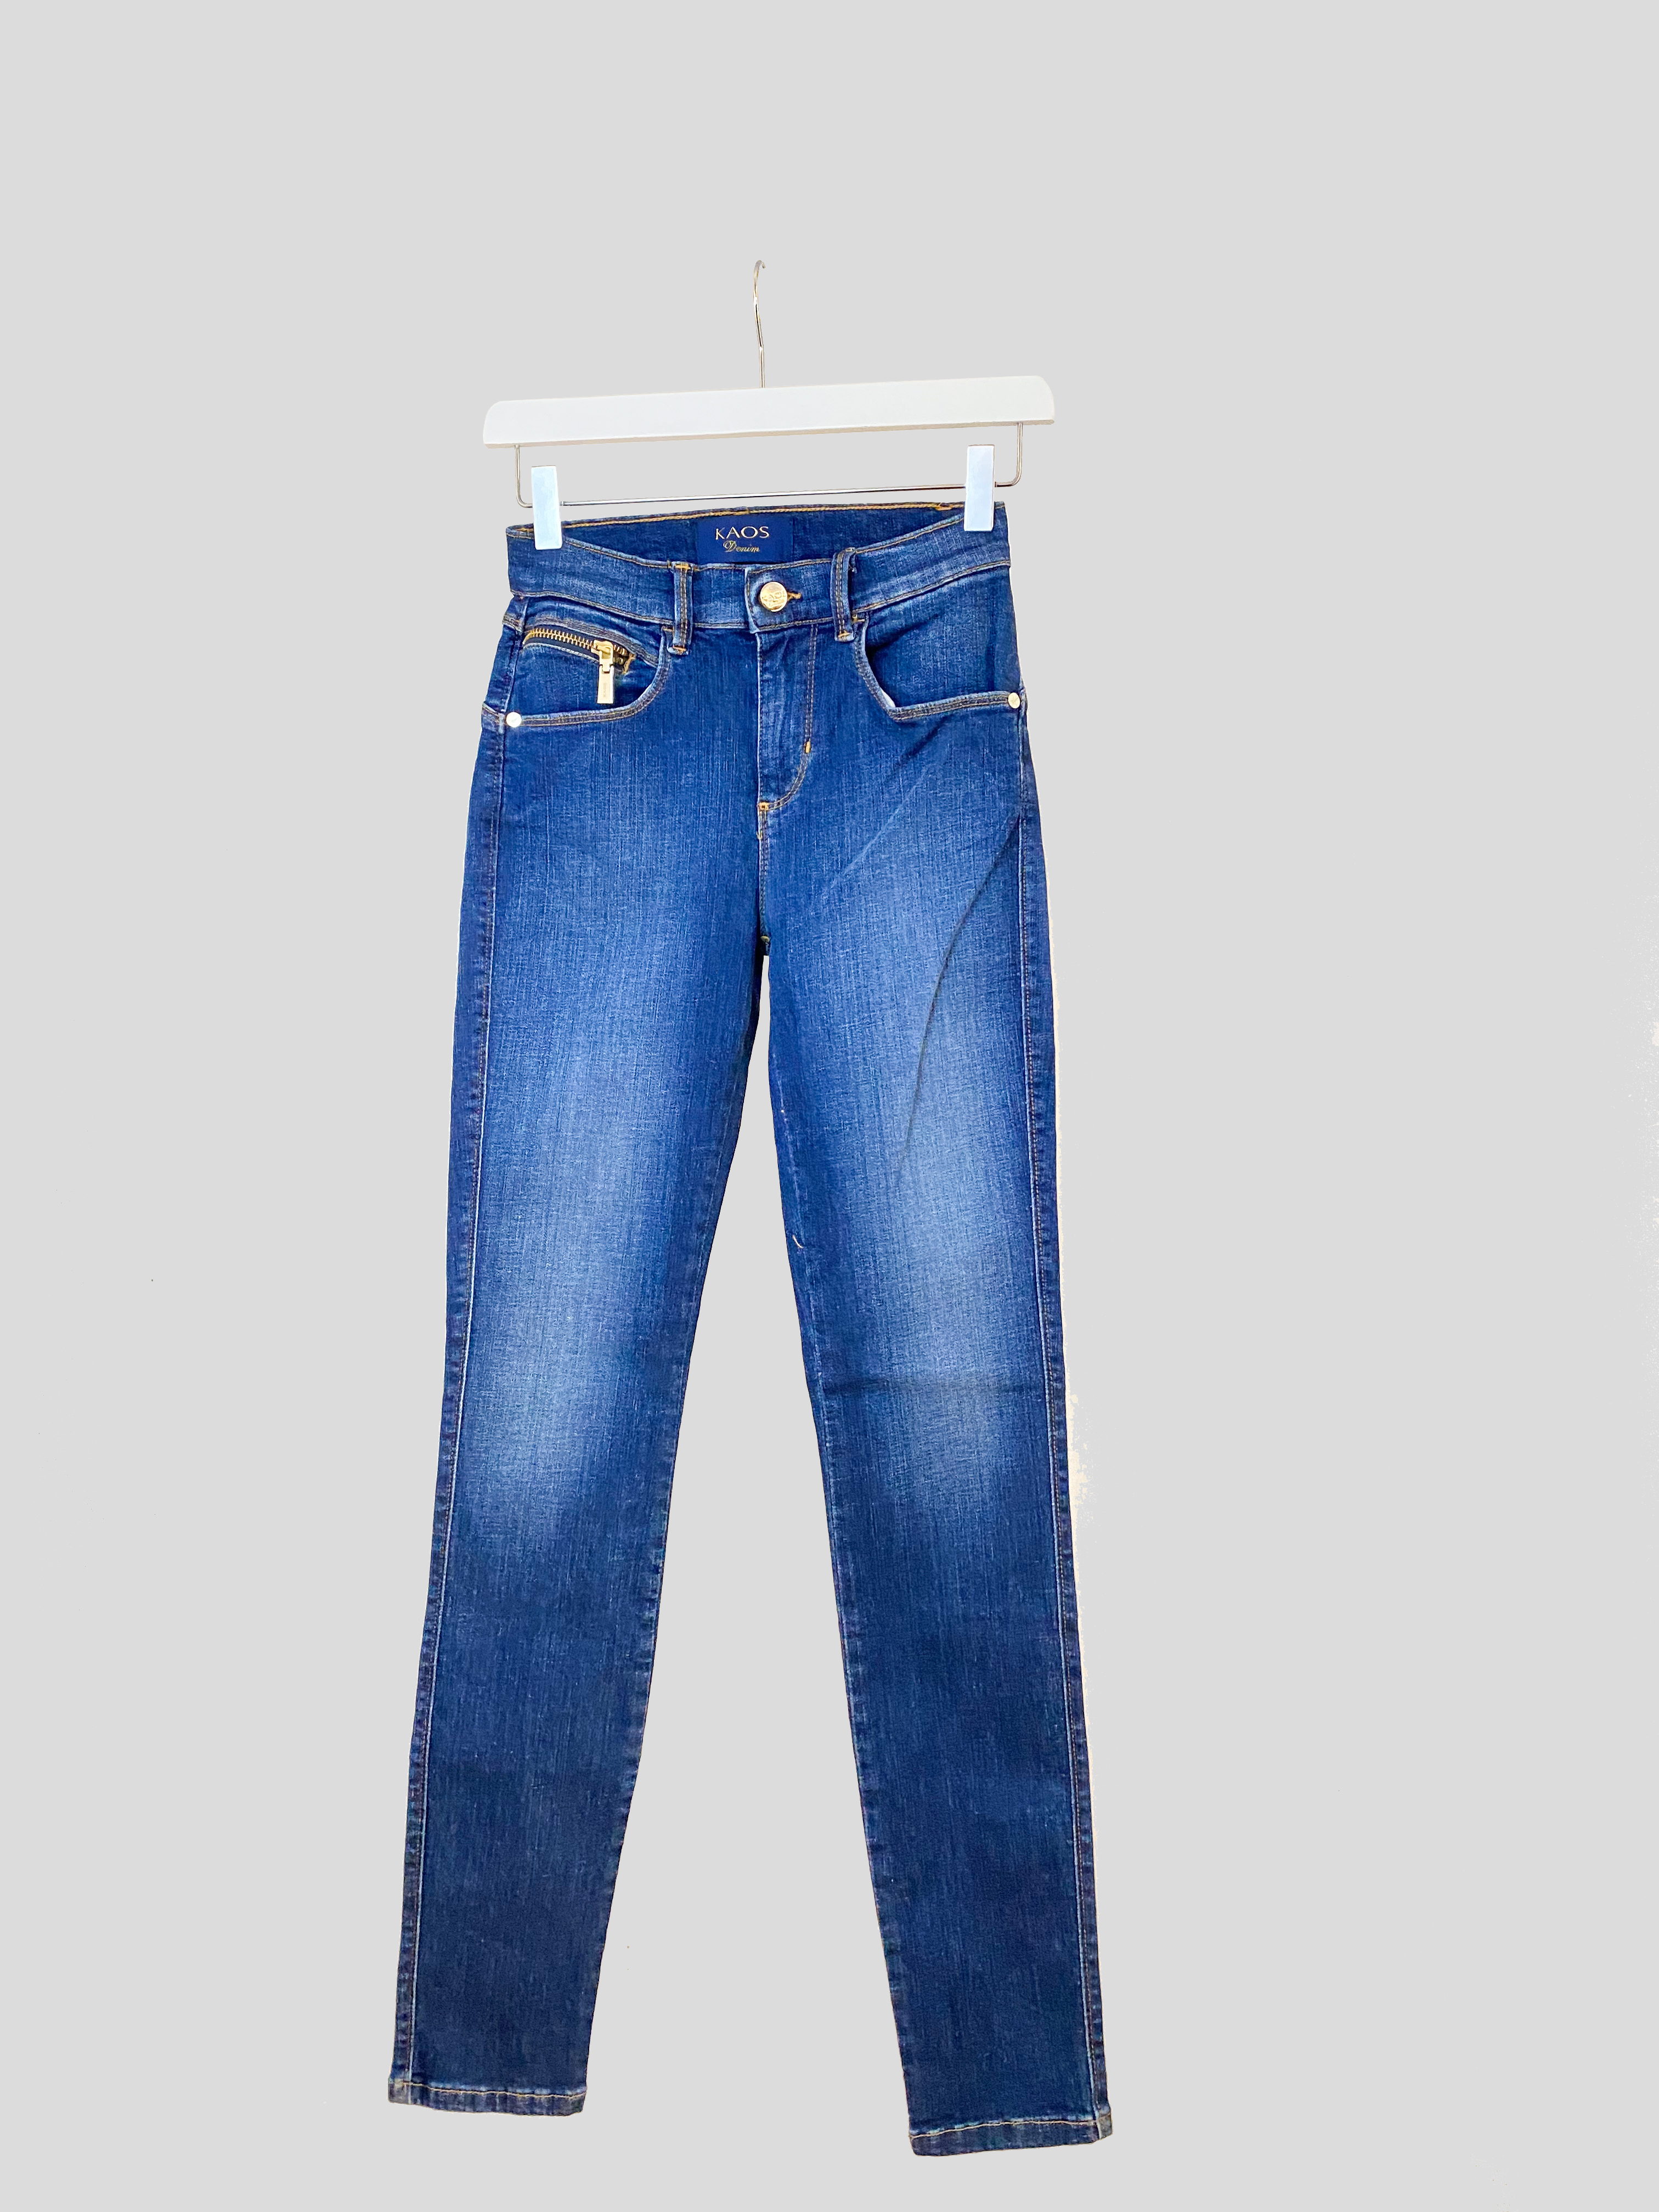 Skinny zip pocket | KAOS